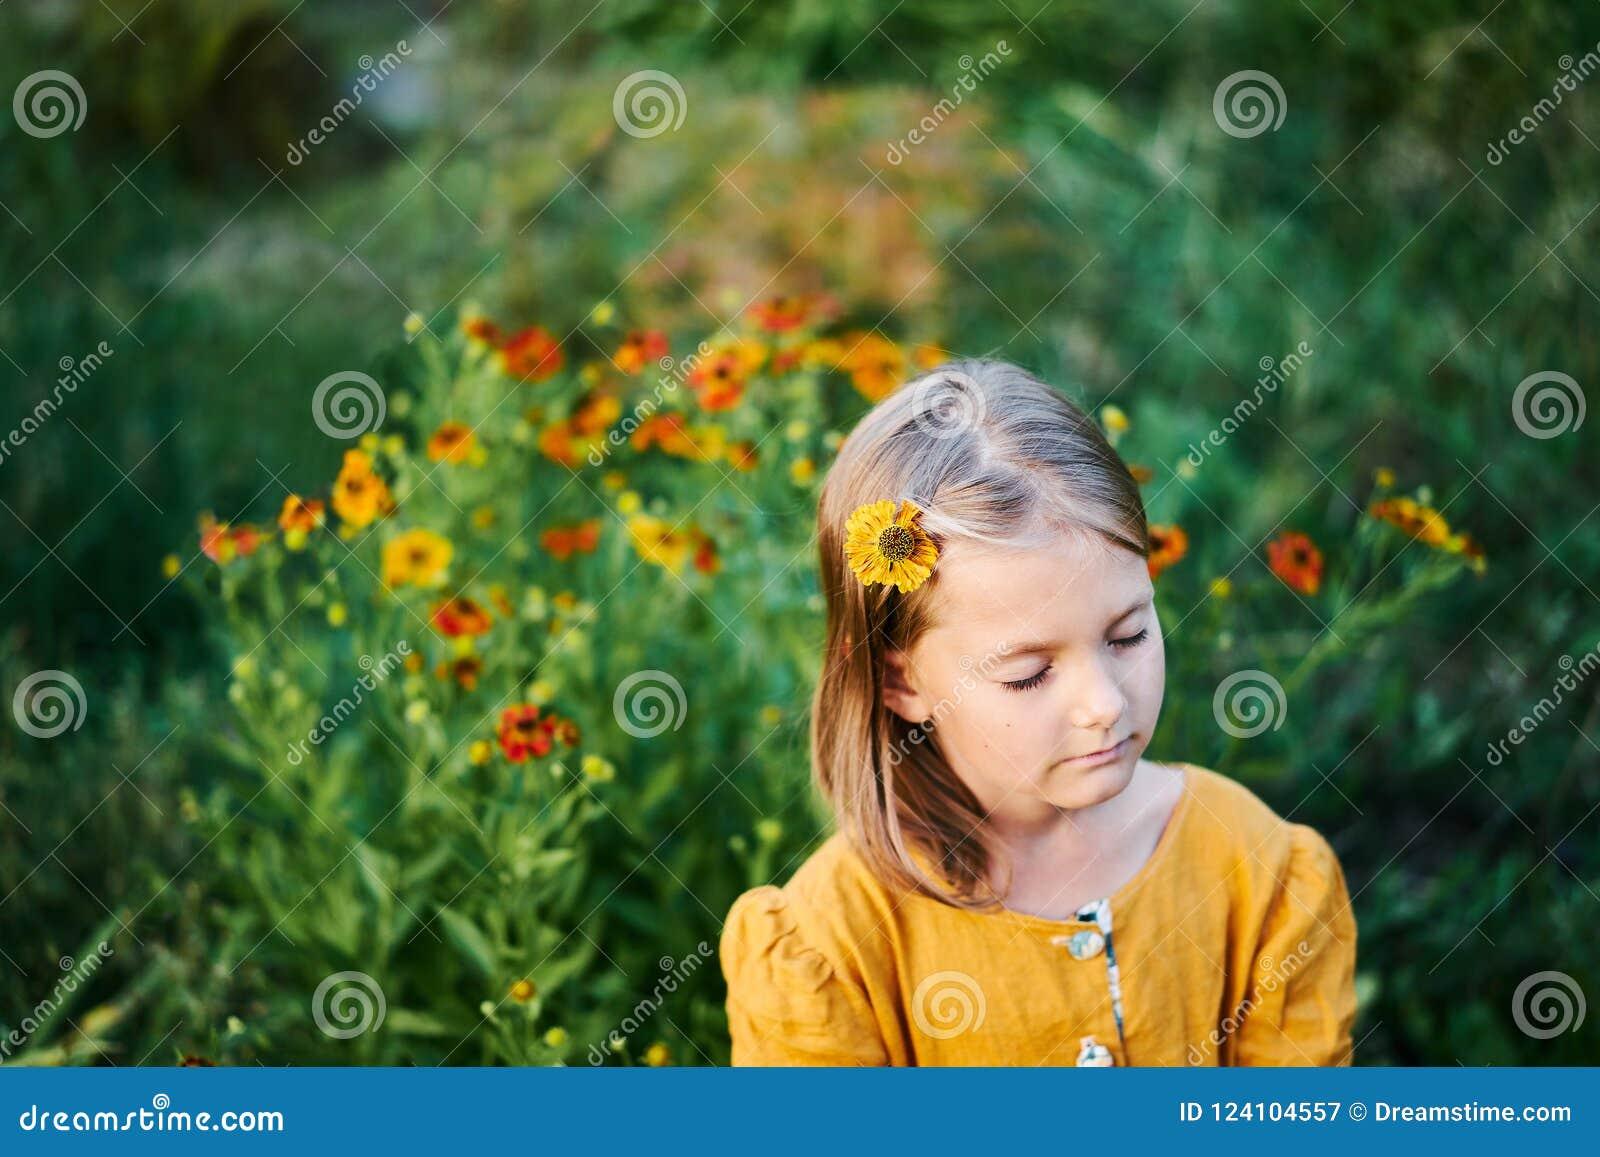 Sono fechado do sonho dos olhos da menina morna da flor das cores